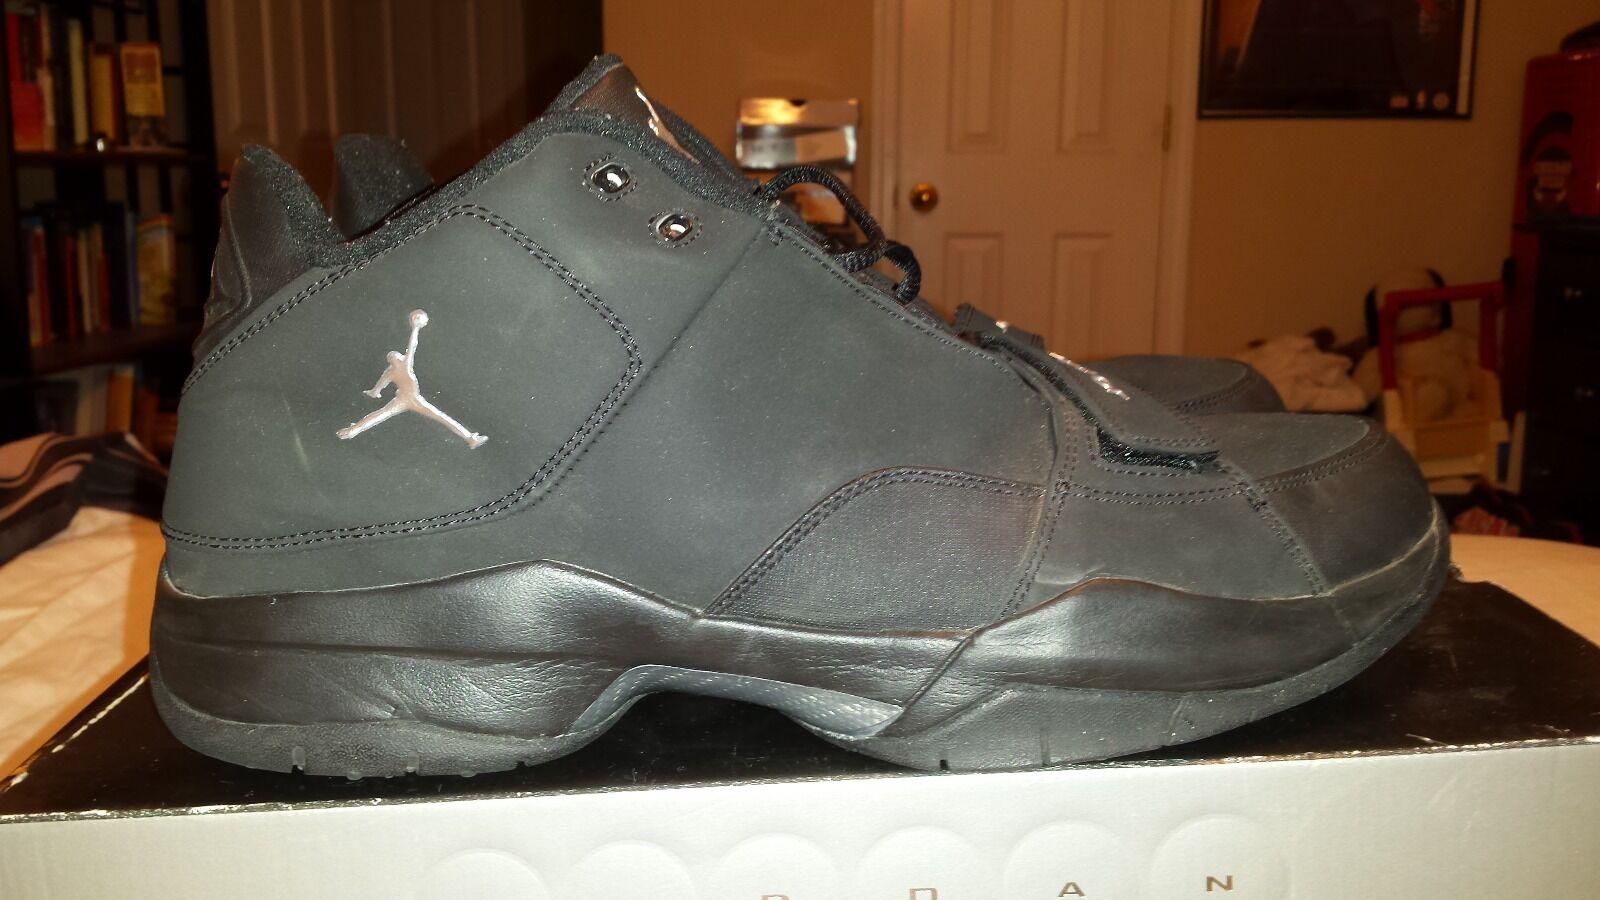 Men's Size 11.5 Air Jordan Tru Speed 2006 RARE LIKENEW Bred Concord Cement Retro